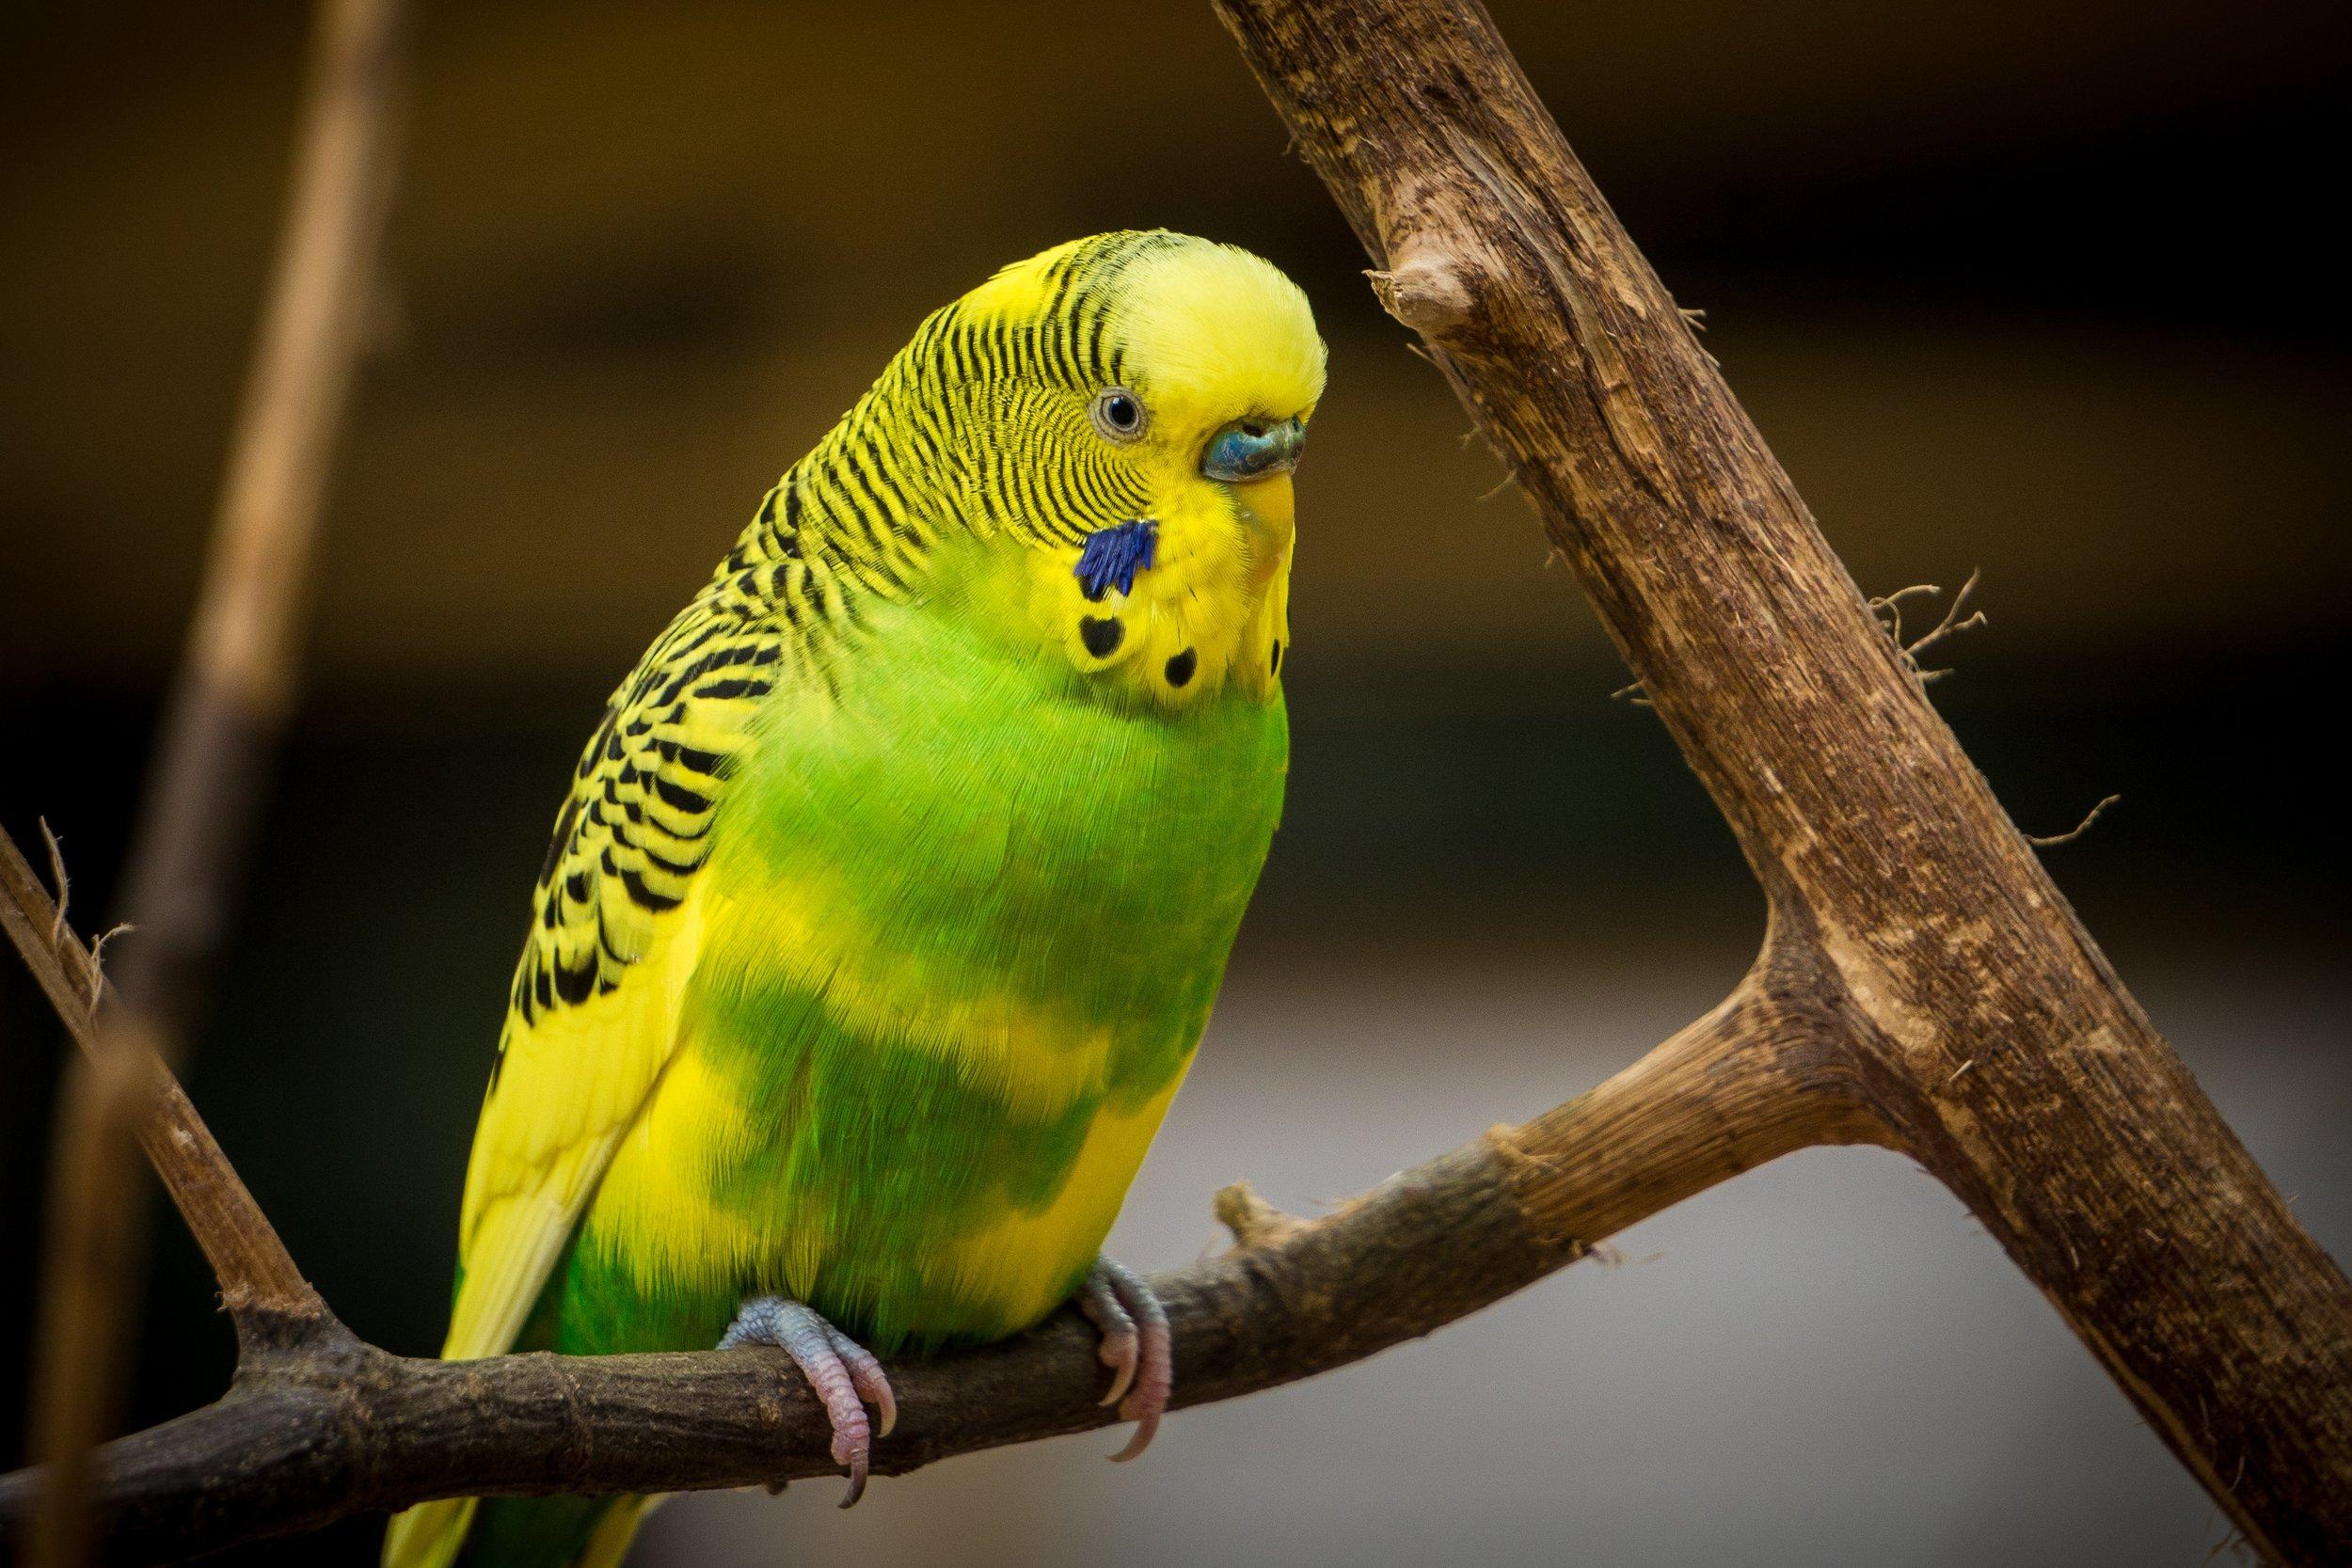 dalton touchberry bird atlanta zoo UP cW.jpg